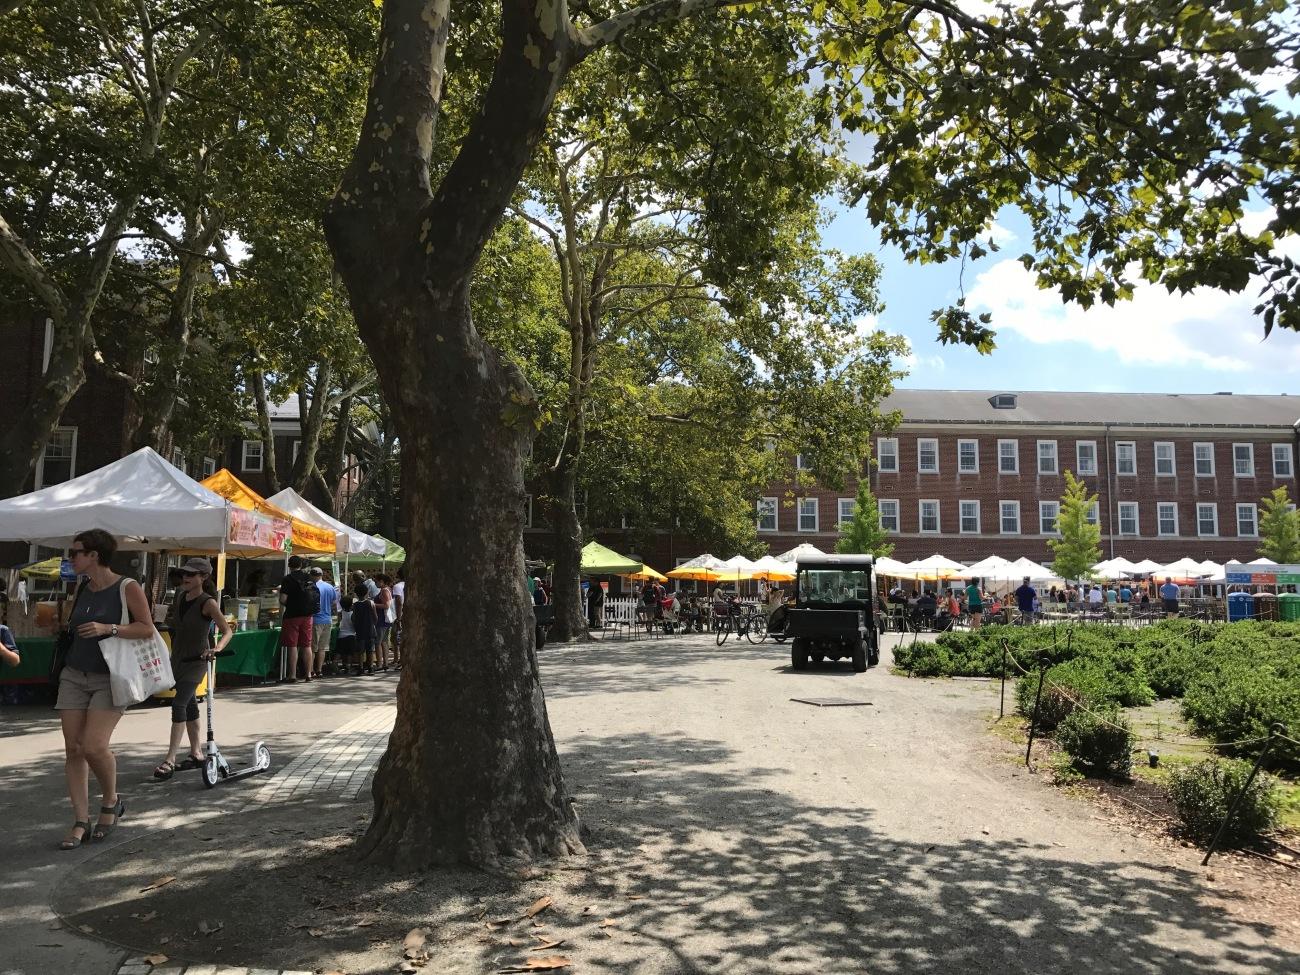 Food Vendors on Governors Island (WildmooBooks.com)